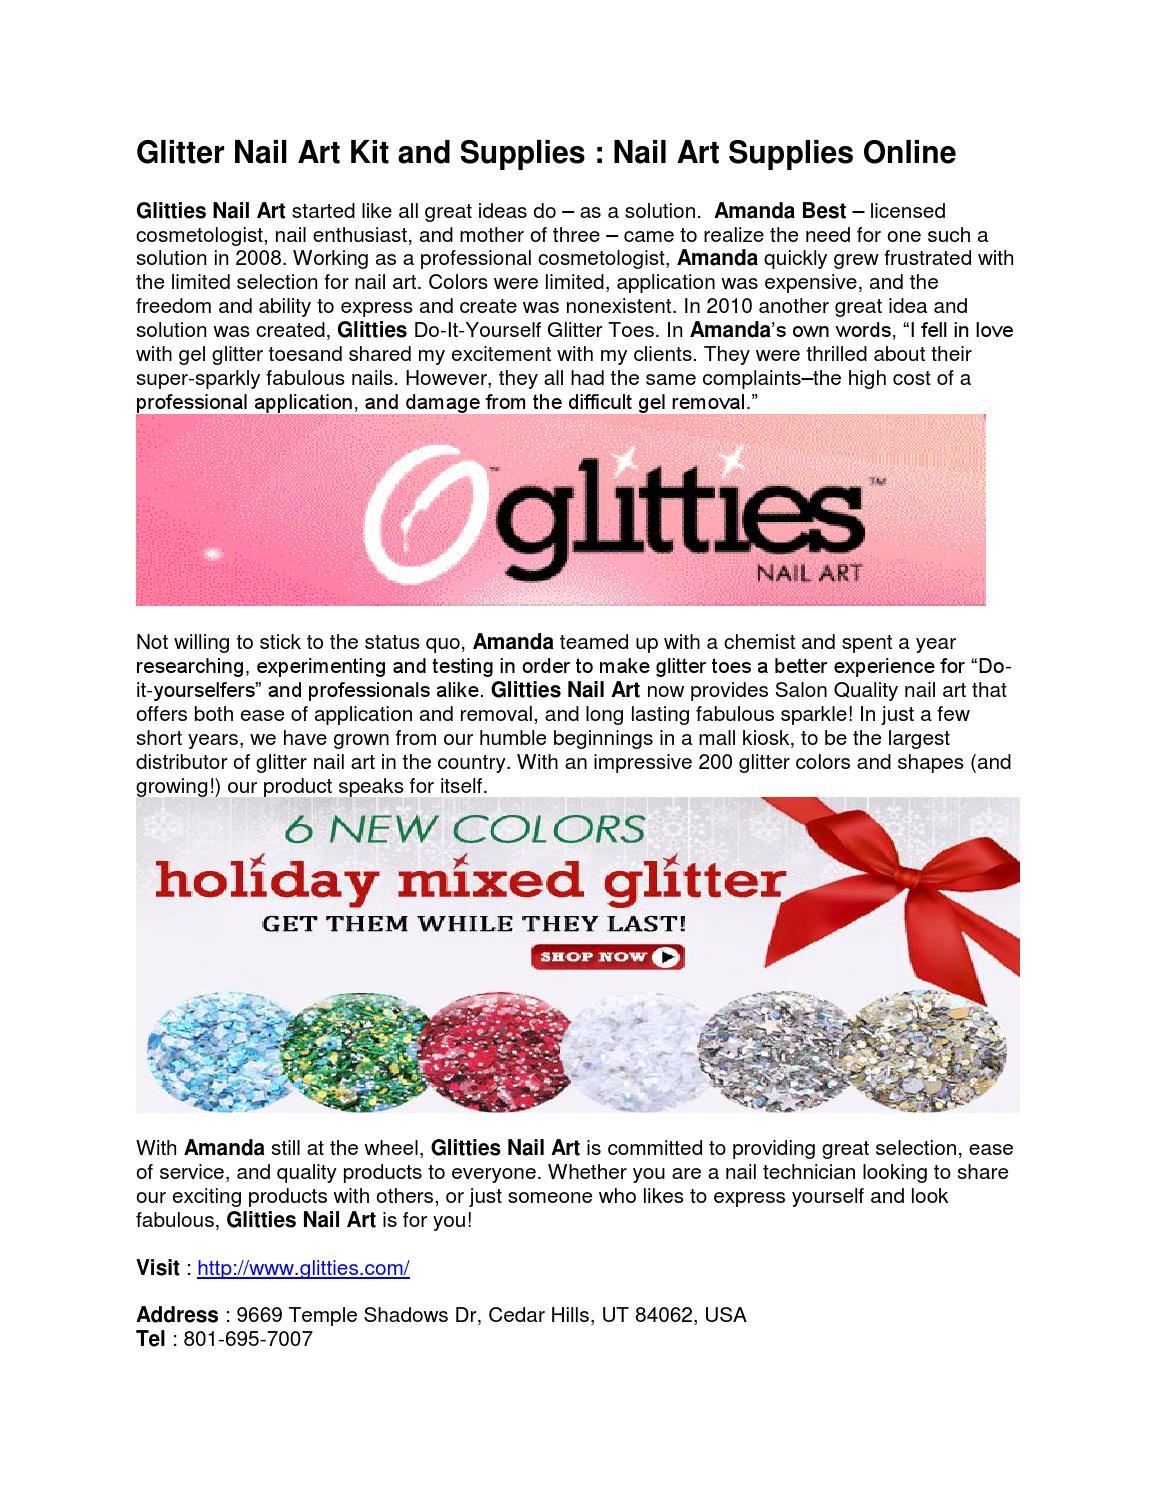 Glitter nail art kit and supplies nail art supplies online by ...